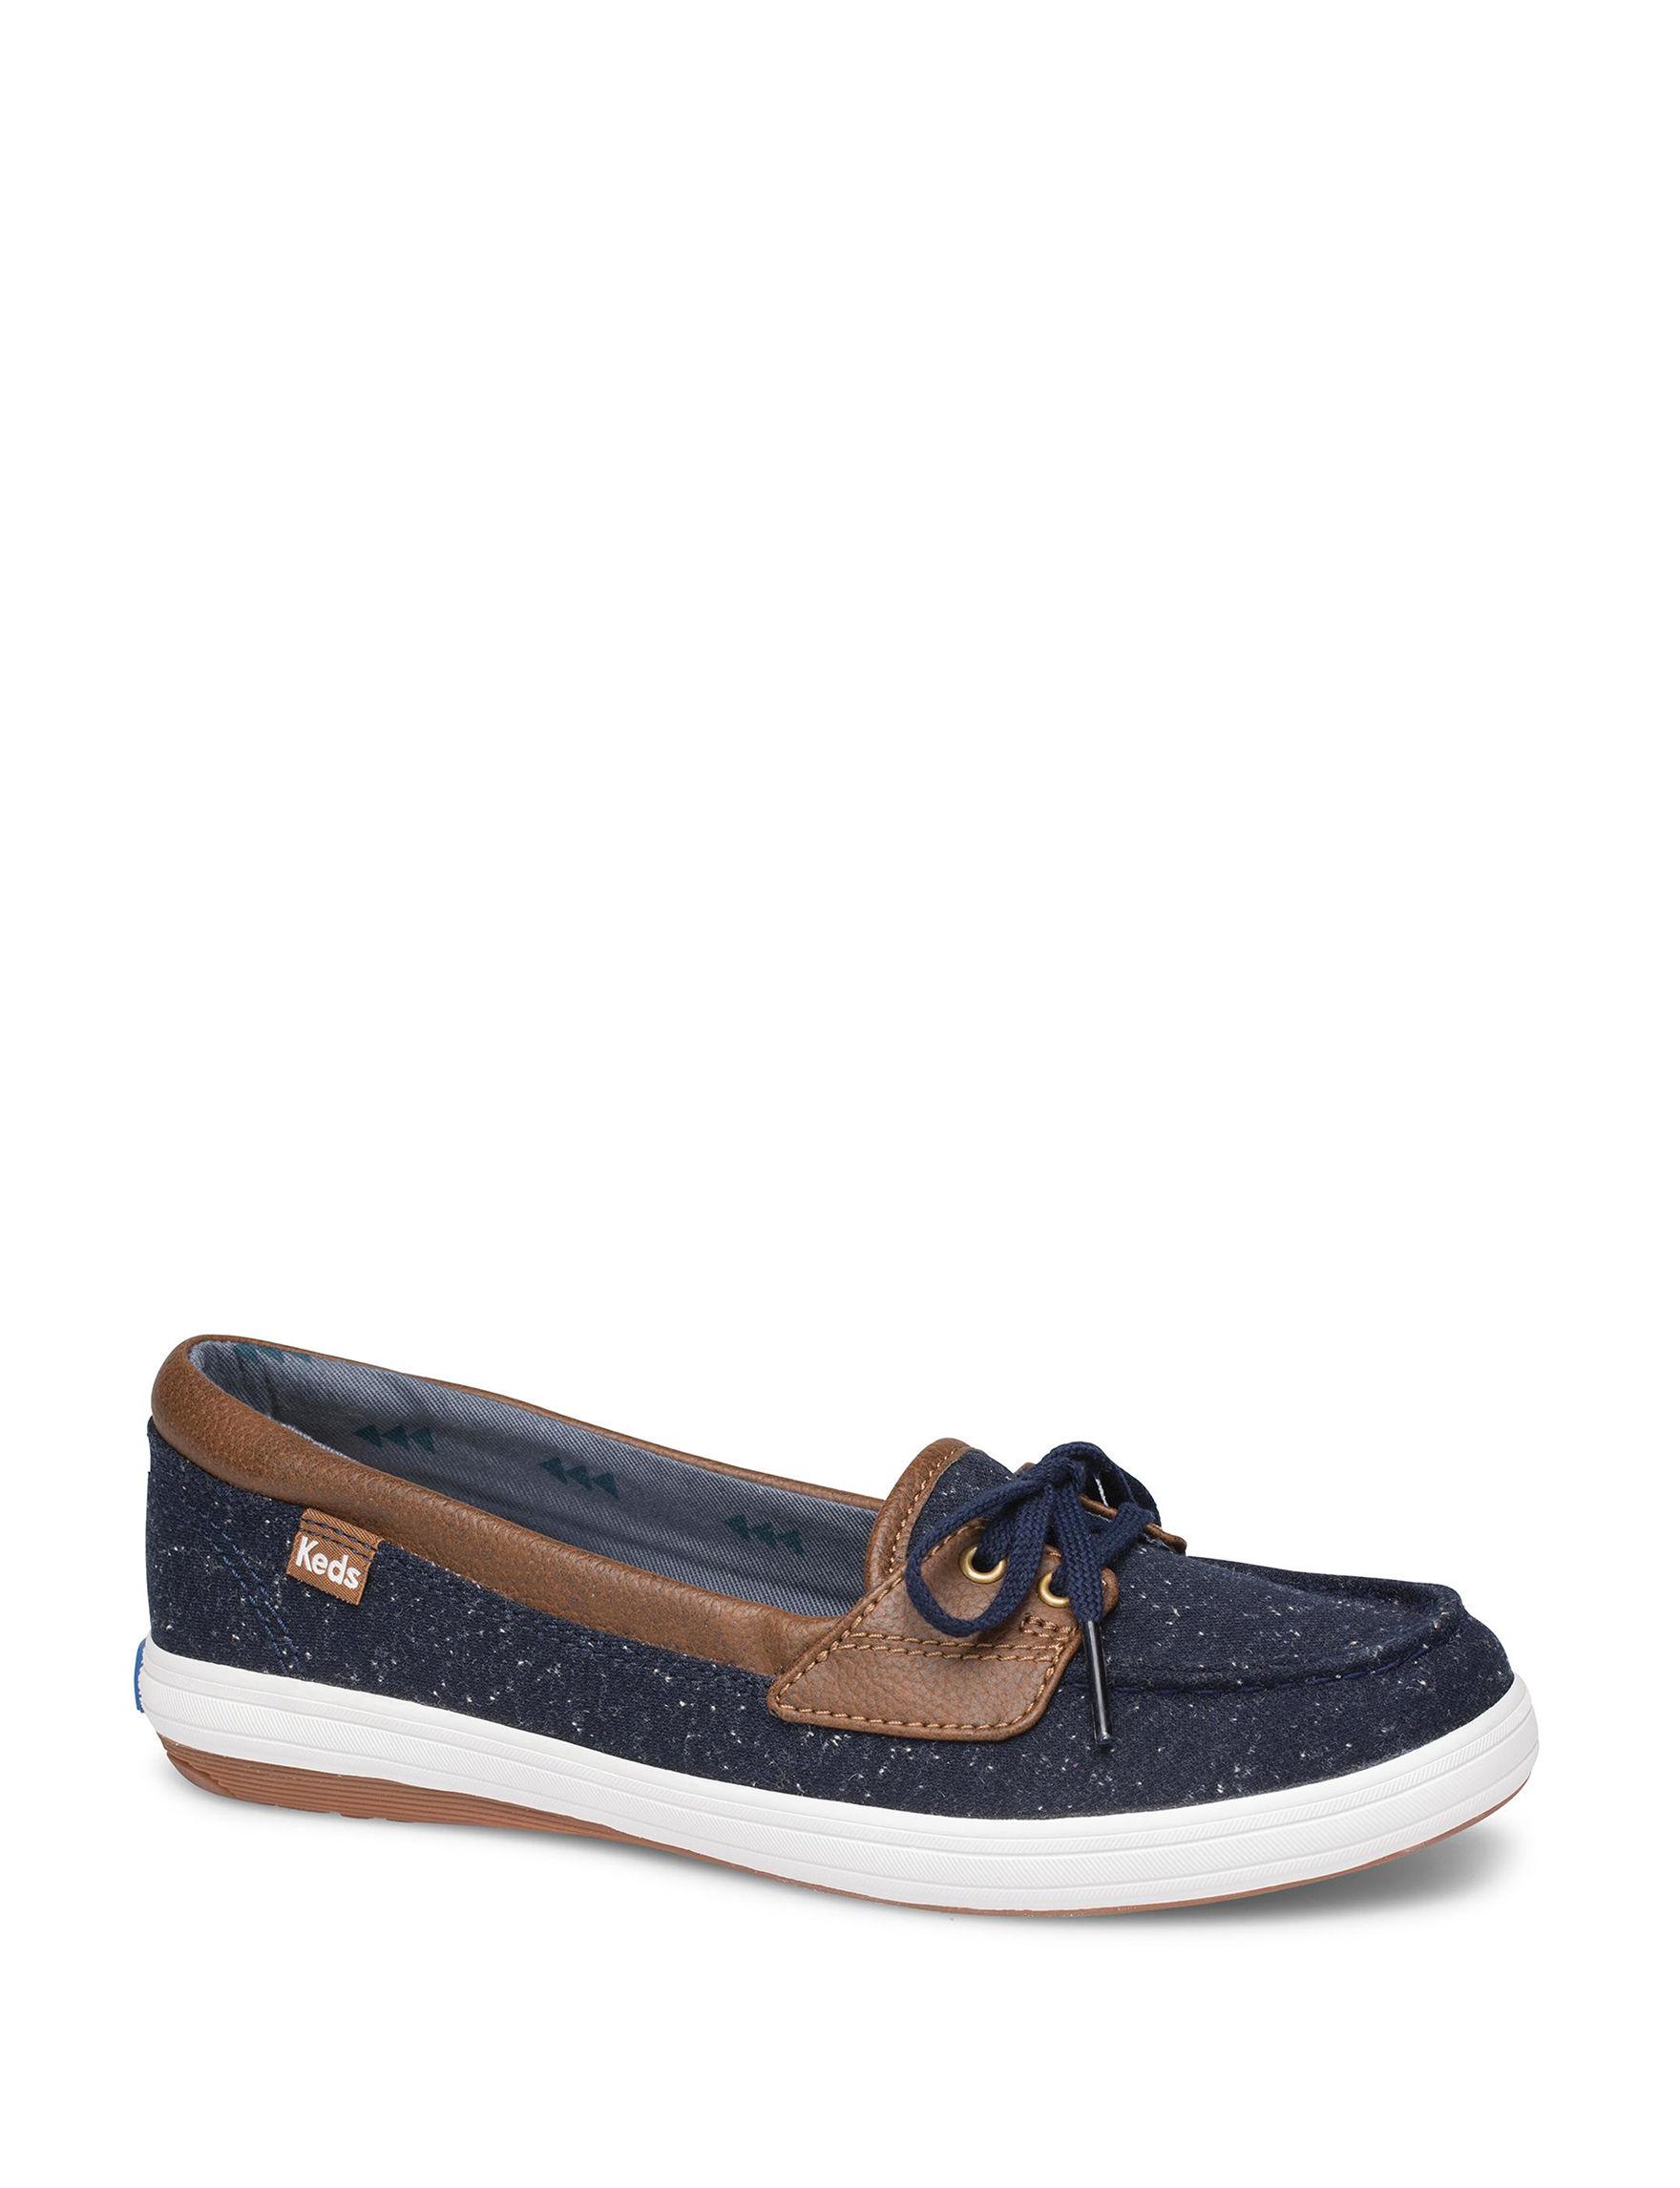 Keds Navy Comfort Shoes